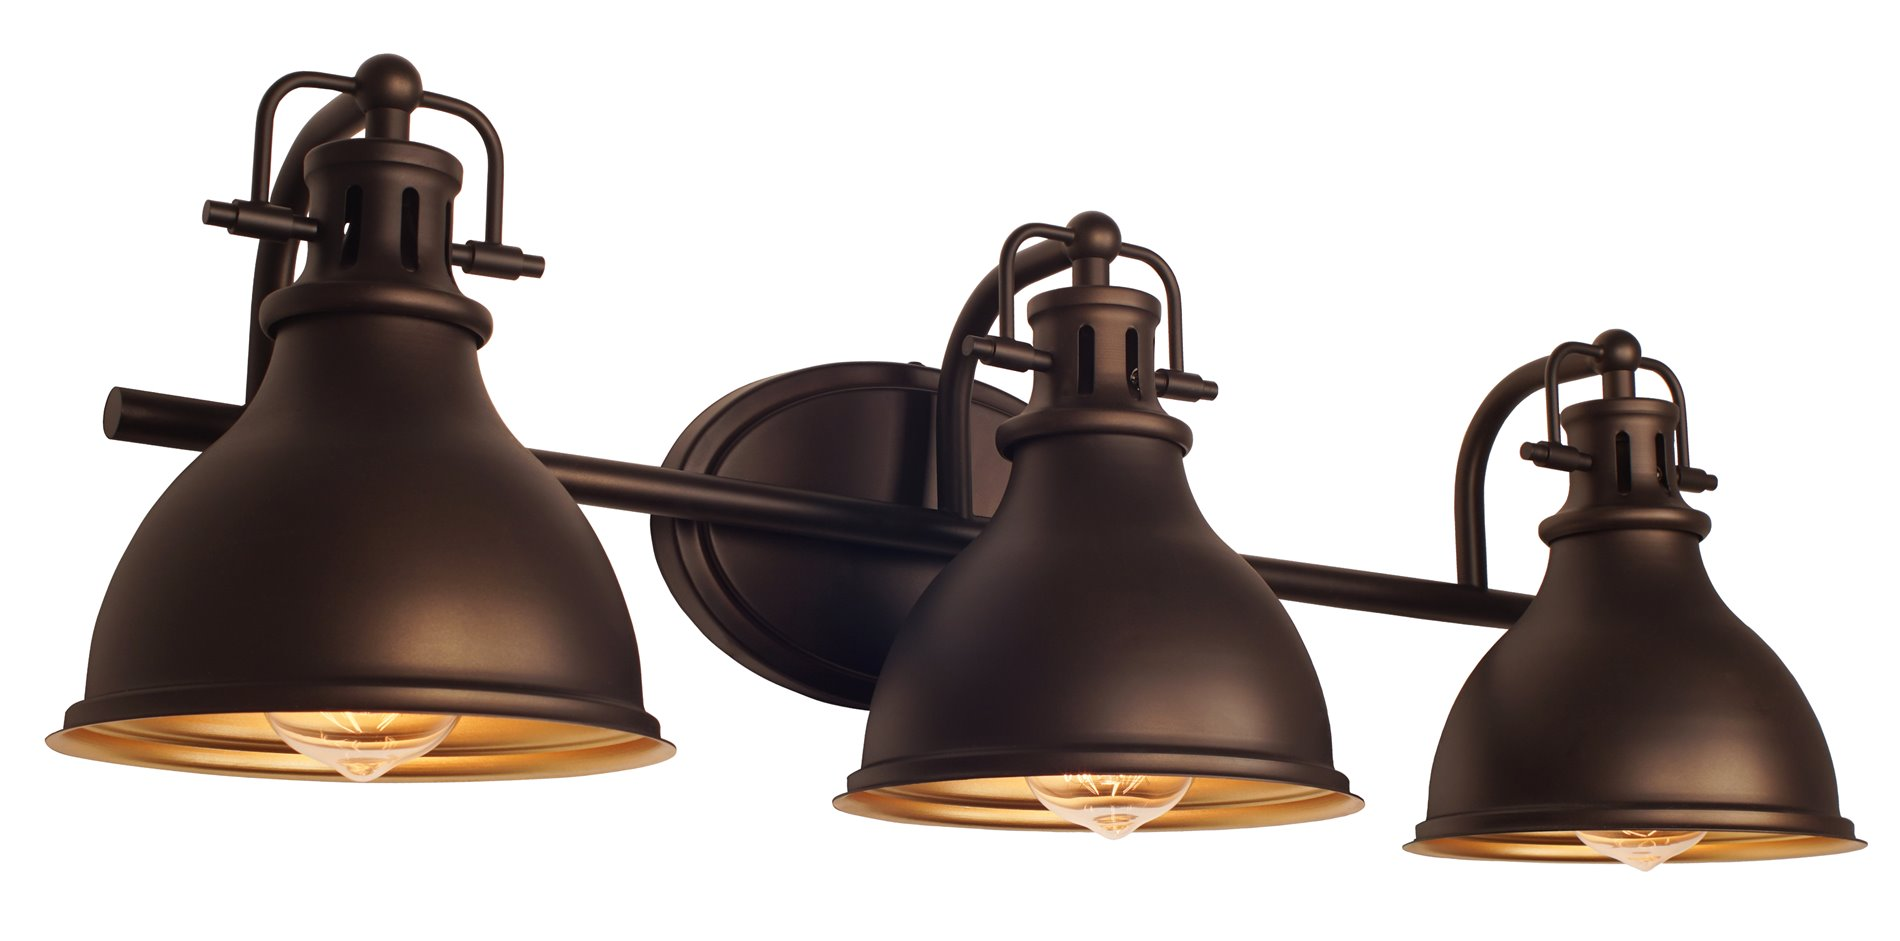 kira home beacon 26 5 3 light traditional vanity bathroom light oil rubbed bronze finish